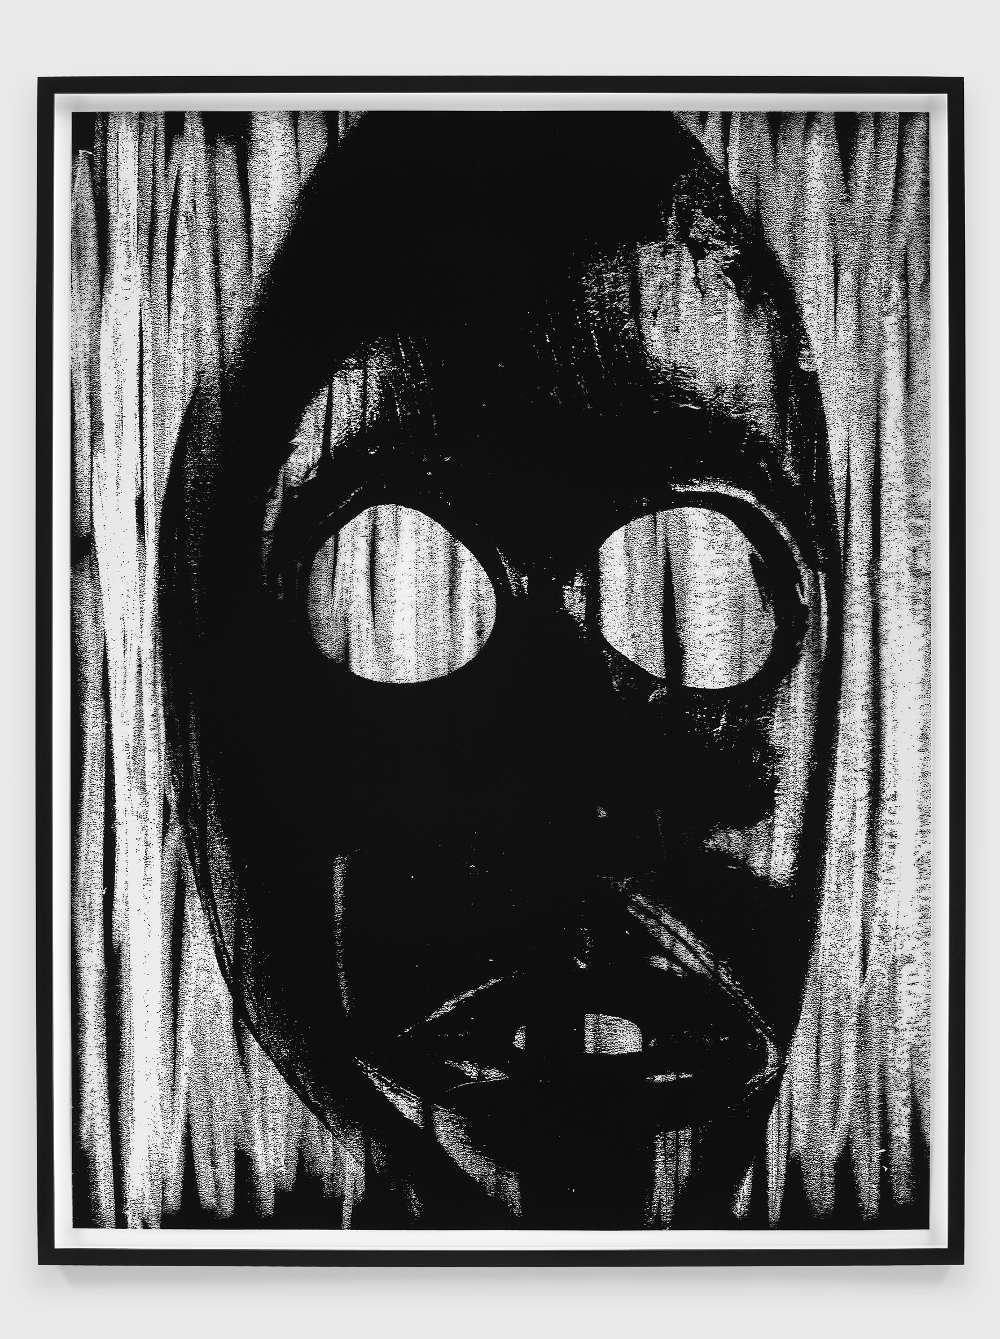 Adam Pendleton, Untitled (mask), 2018. Silkscreen ink on Mylar Sheet: 131 x 100.5 cm / 51 1/2 x 39 1/2 in. Framed: 138 x 107.5 cm / 54 3/8 x 42 3/8 in © Adam Pendleton. Courtesy the artist and Galerie Eva Presenhuber, Zurich / New York